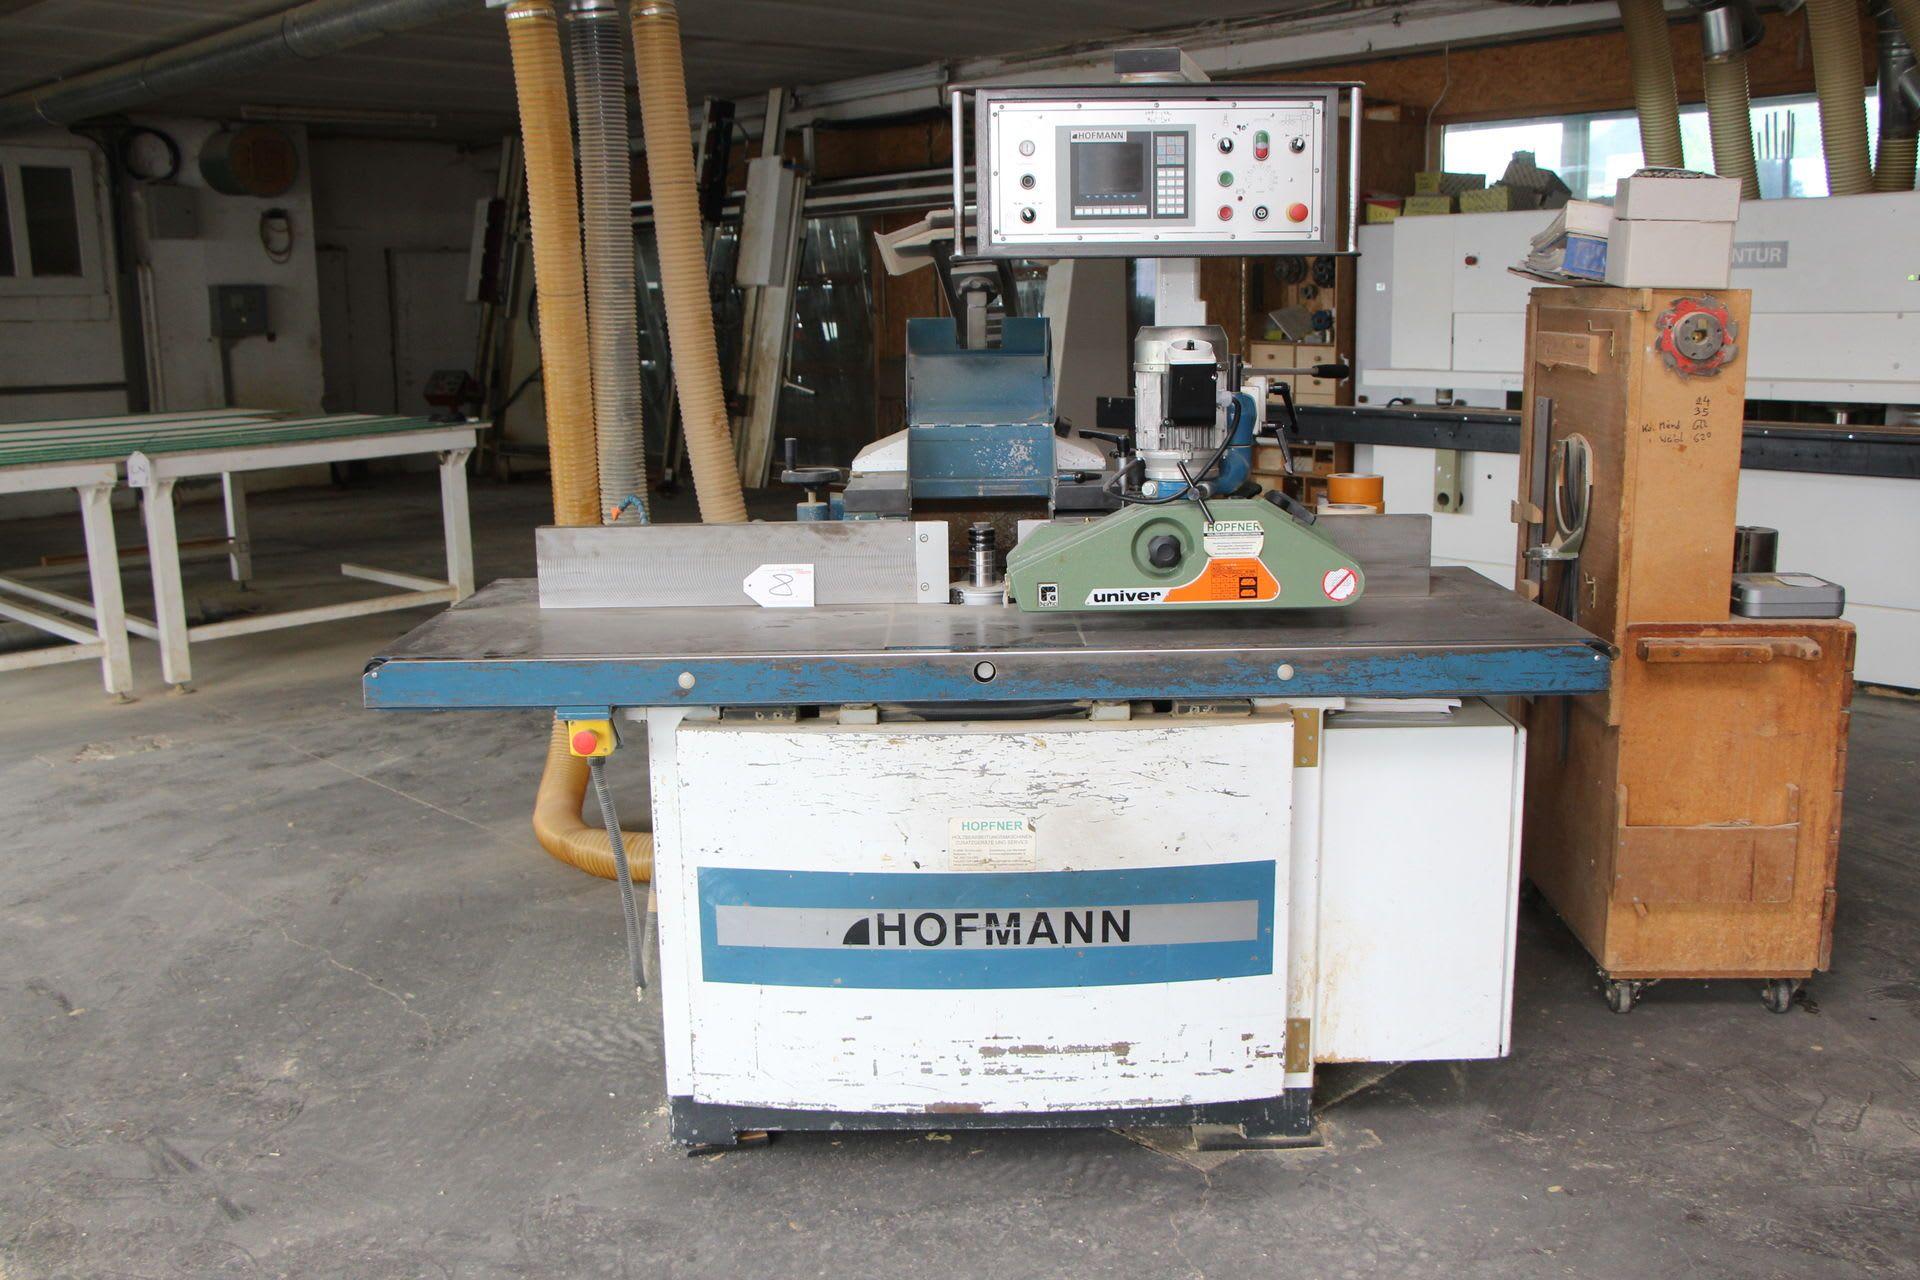 HOFMANN UFN 210 Universal-Schwenkfräsmaschine